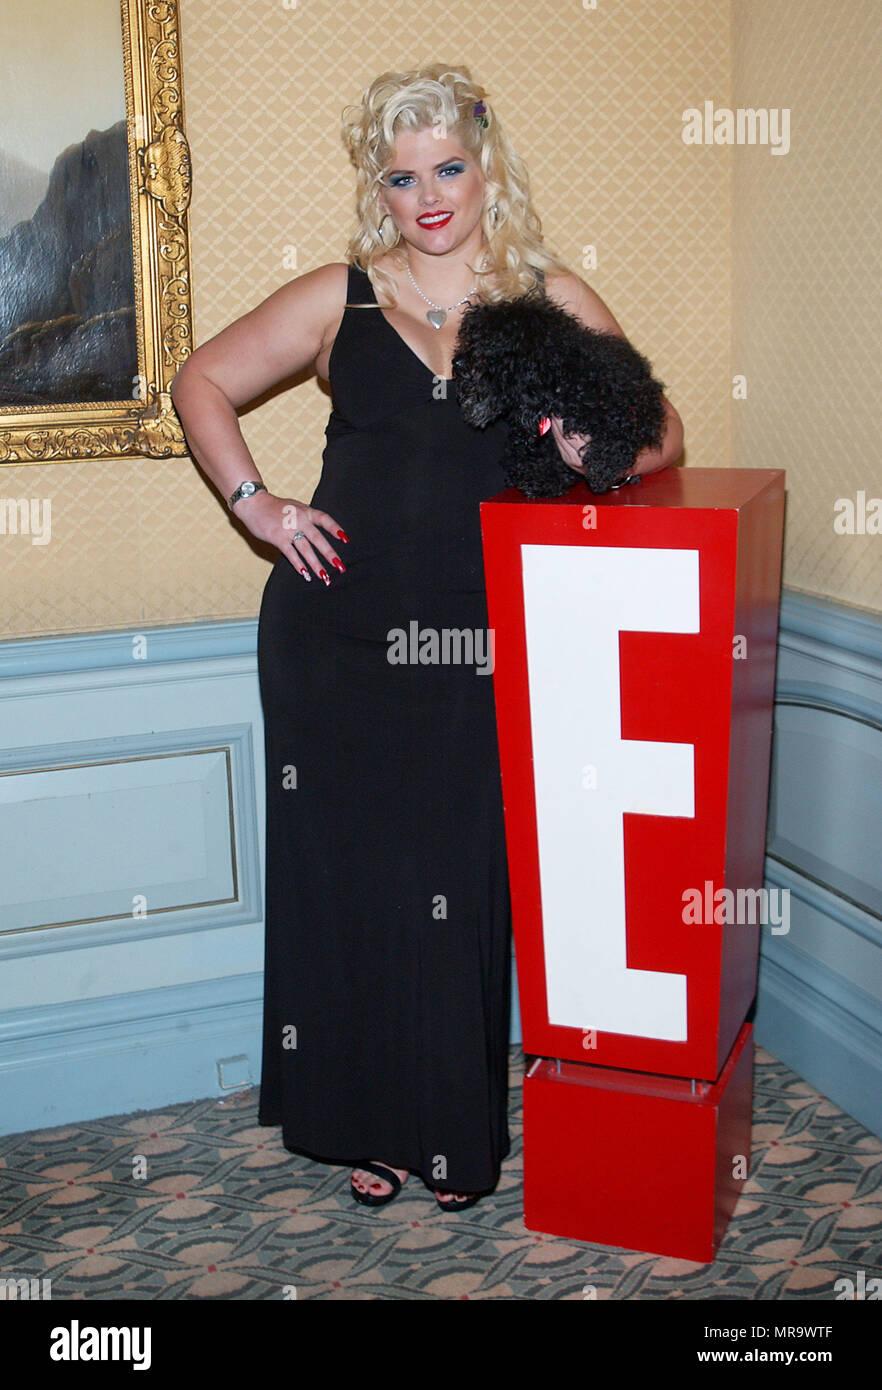 The Anna Nicole Smith Show Stock Photos & The Anna Nicole Smith Show